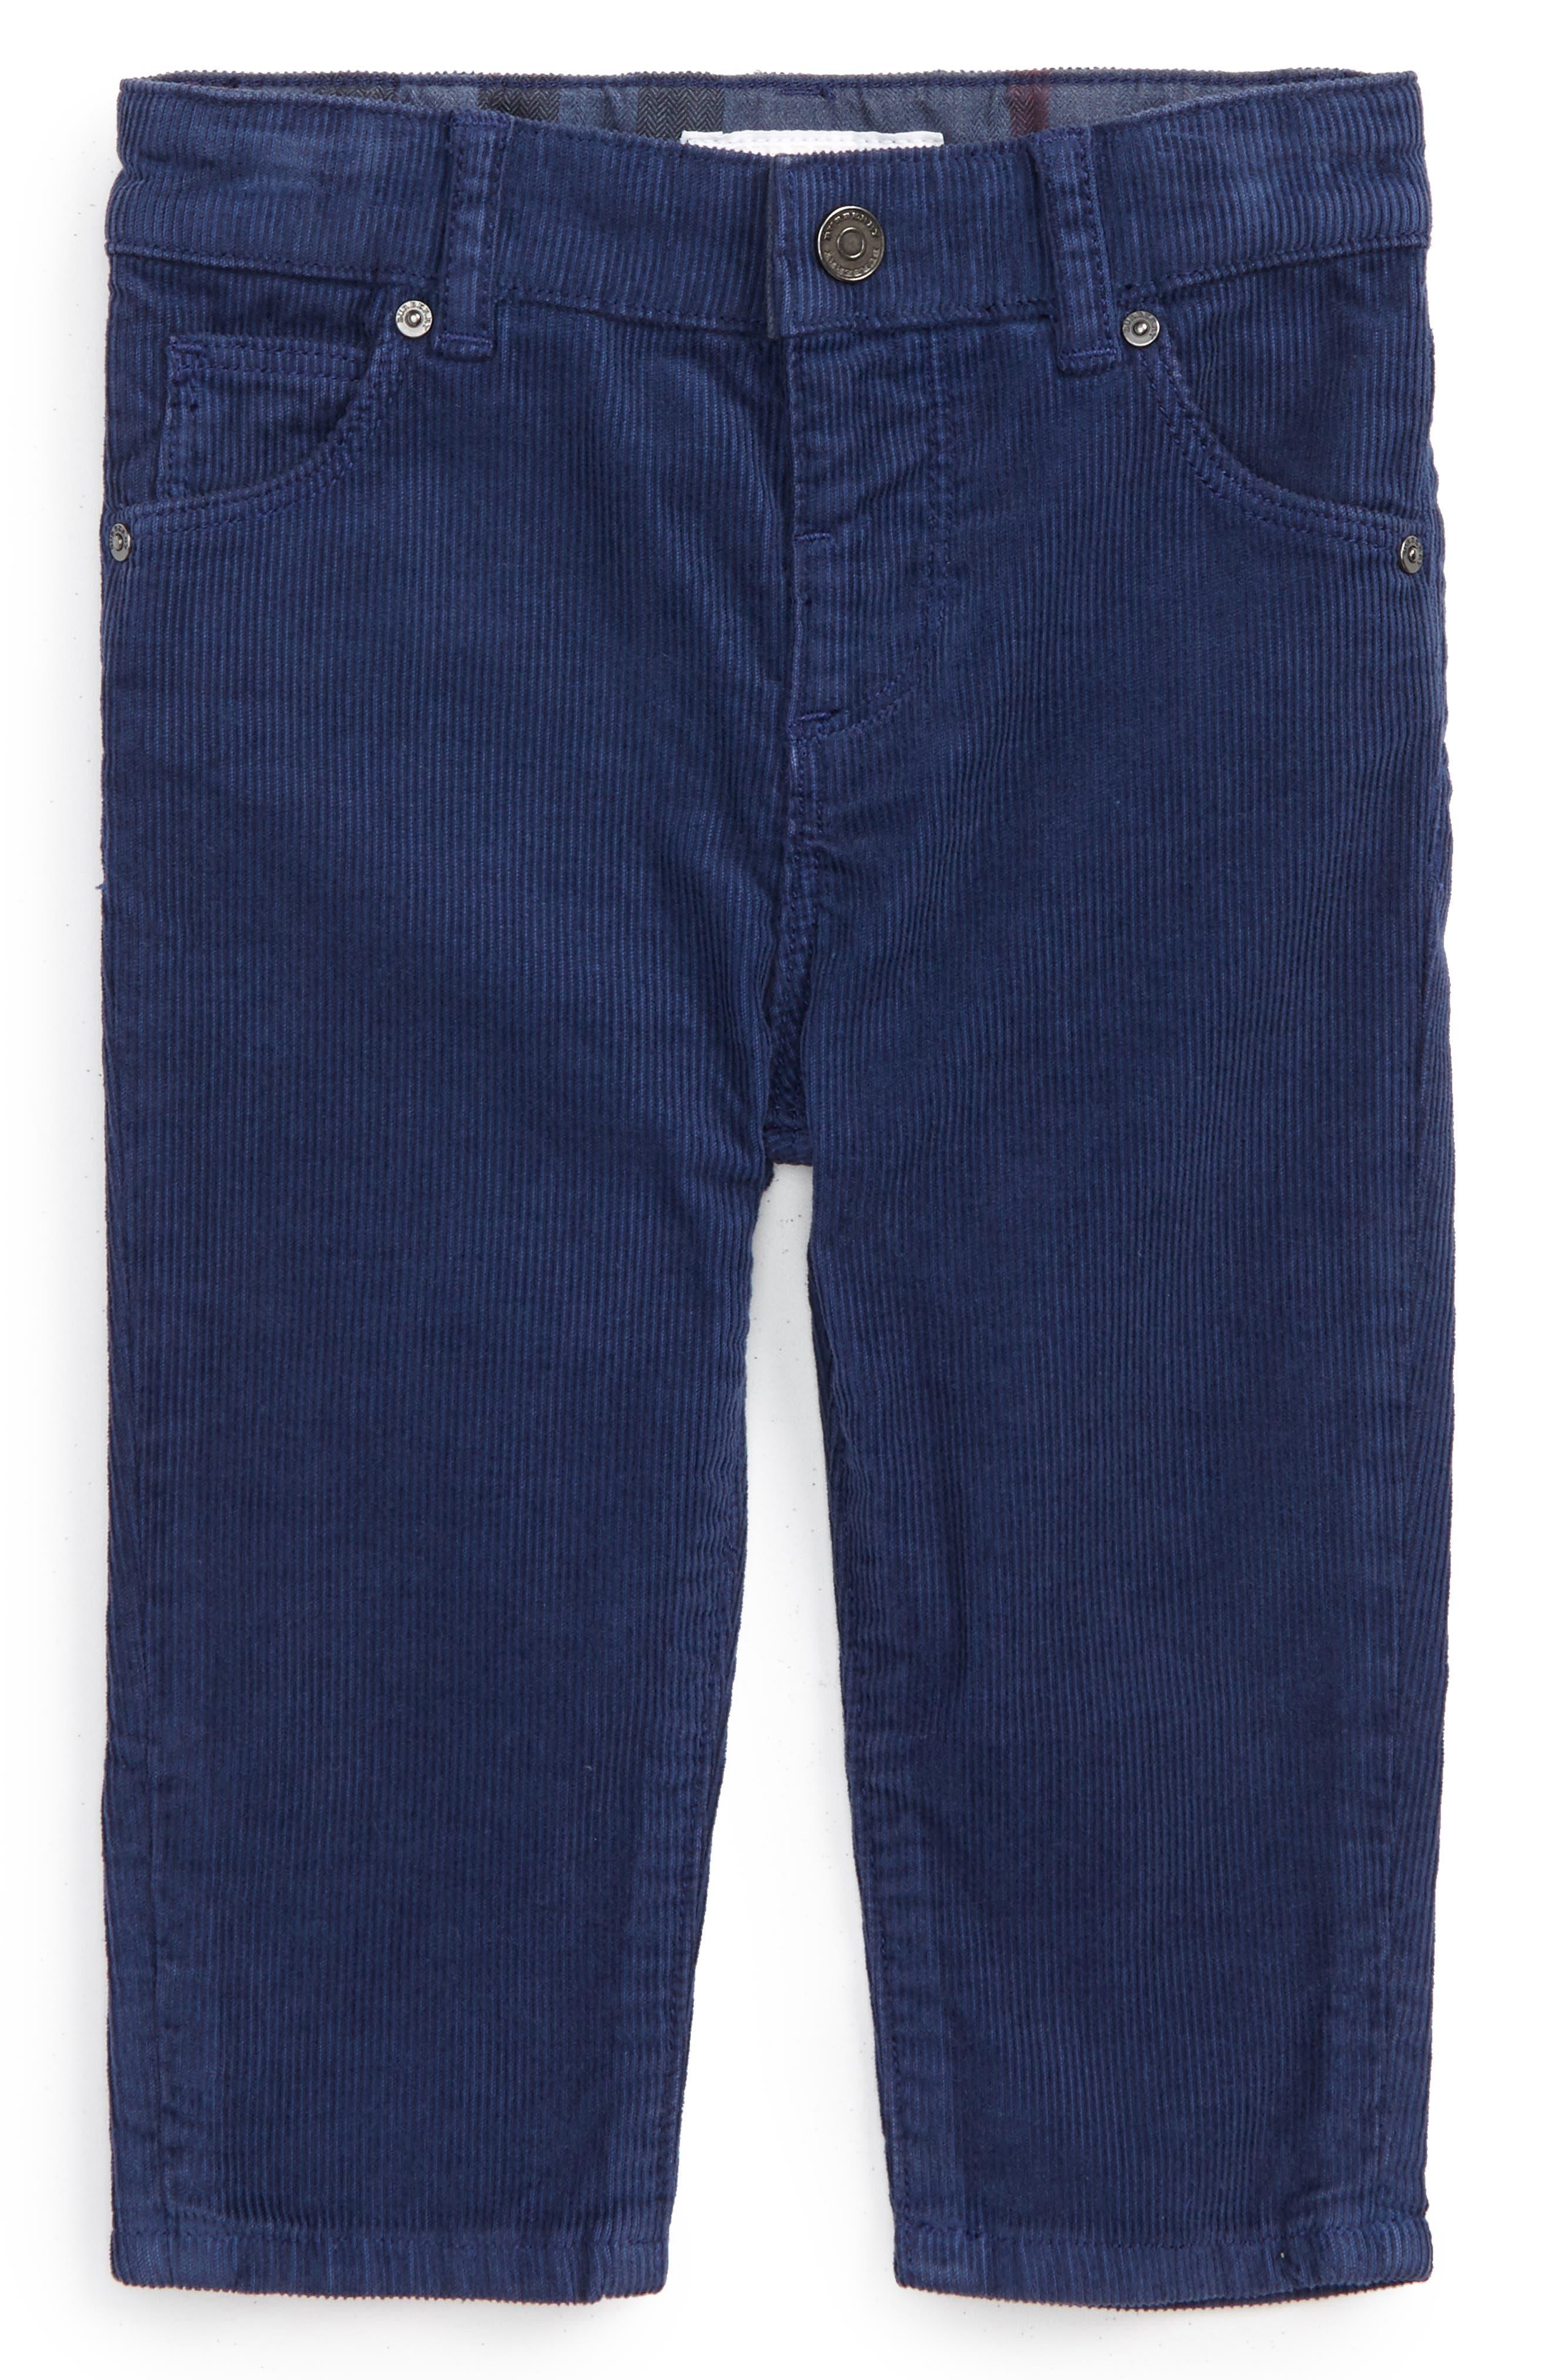 Burberry Langston Corduroy Skinny Pants (Baby Boys)